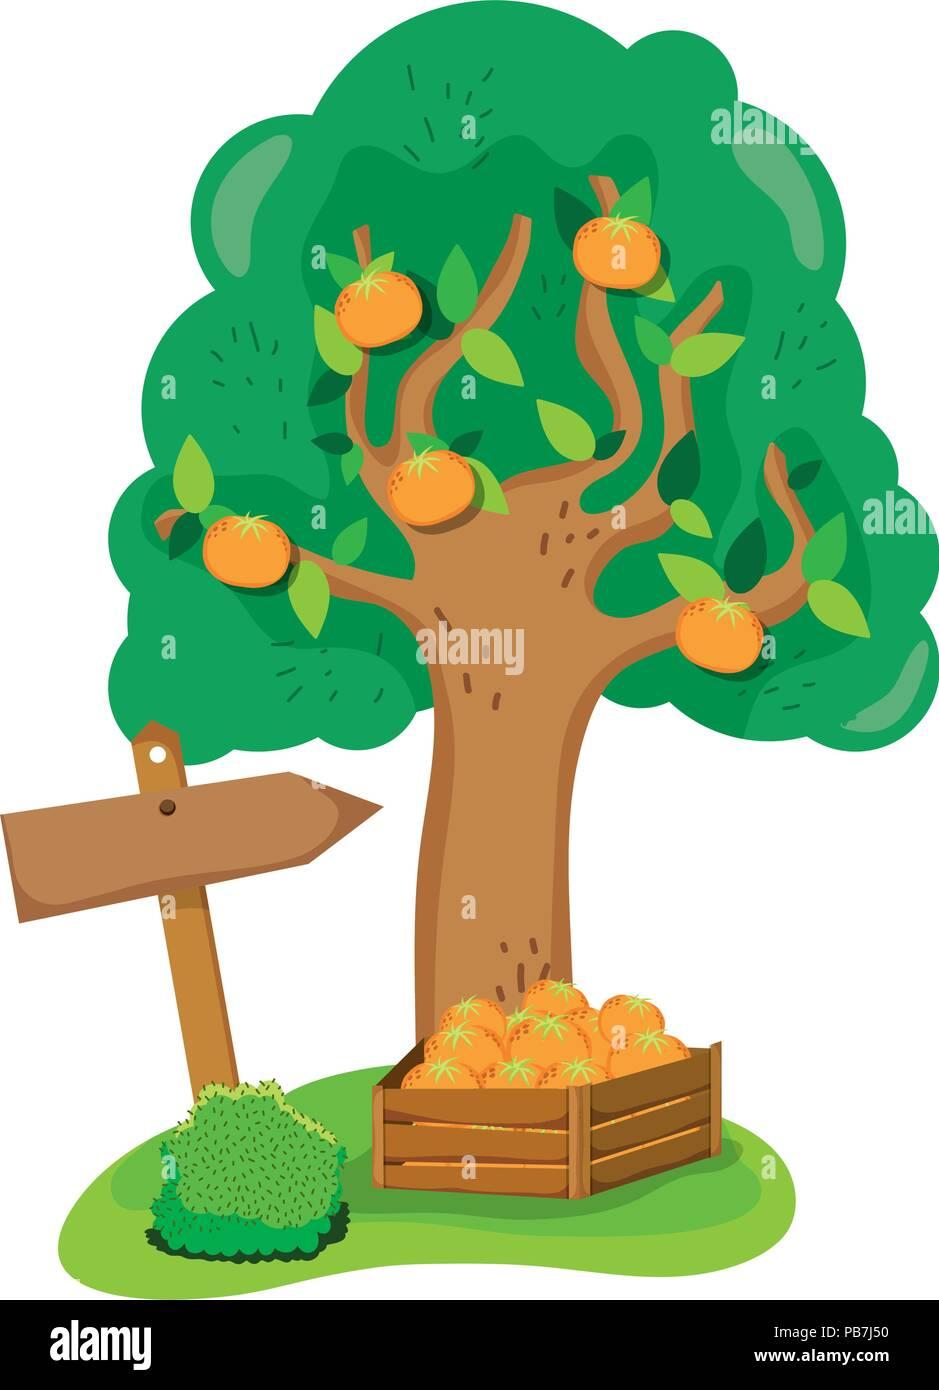 farm fruit tree and oranges inside wood box - Stock Vector